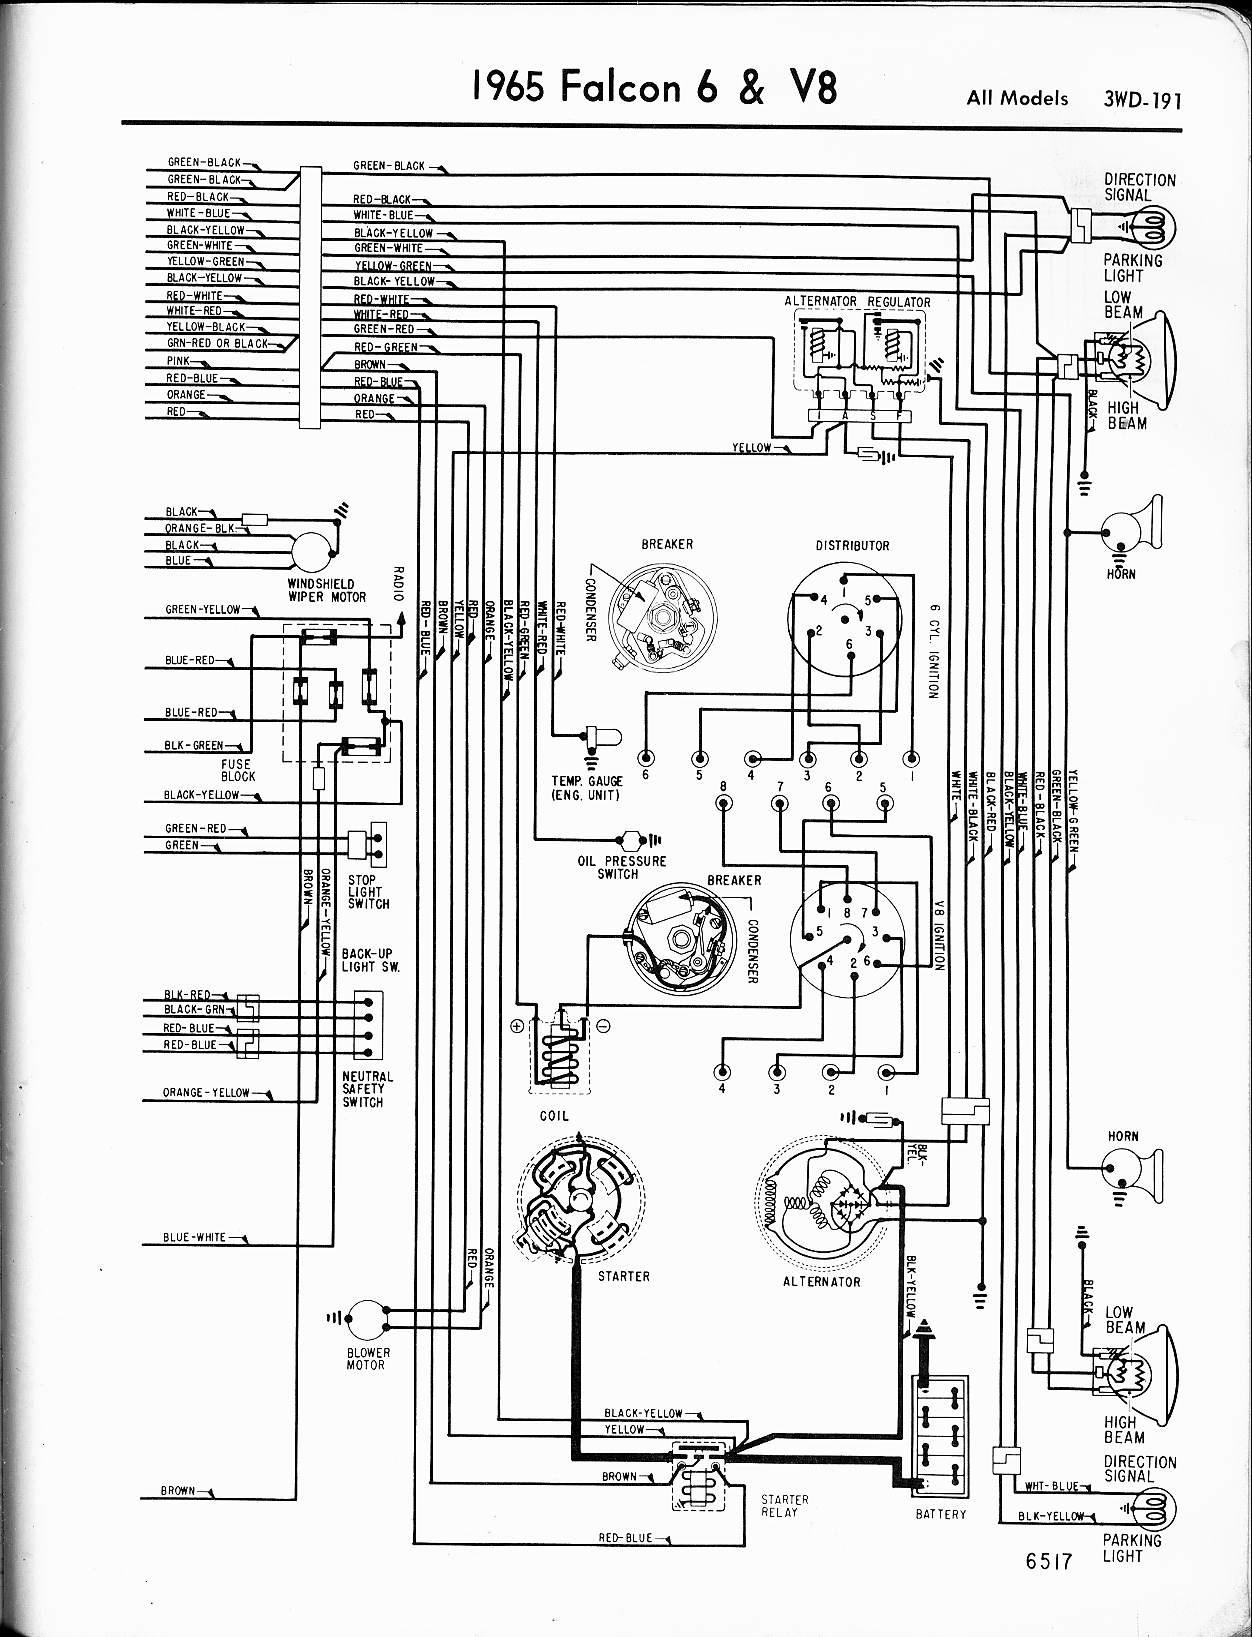 ford 351 distributor wiring diagram free download 87 ford 351 distributor wiring diagram motorcraft distributor 12127 wiring diagram | free wiring ...